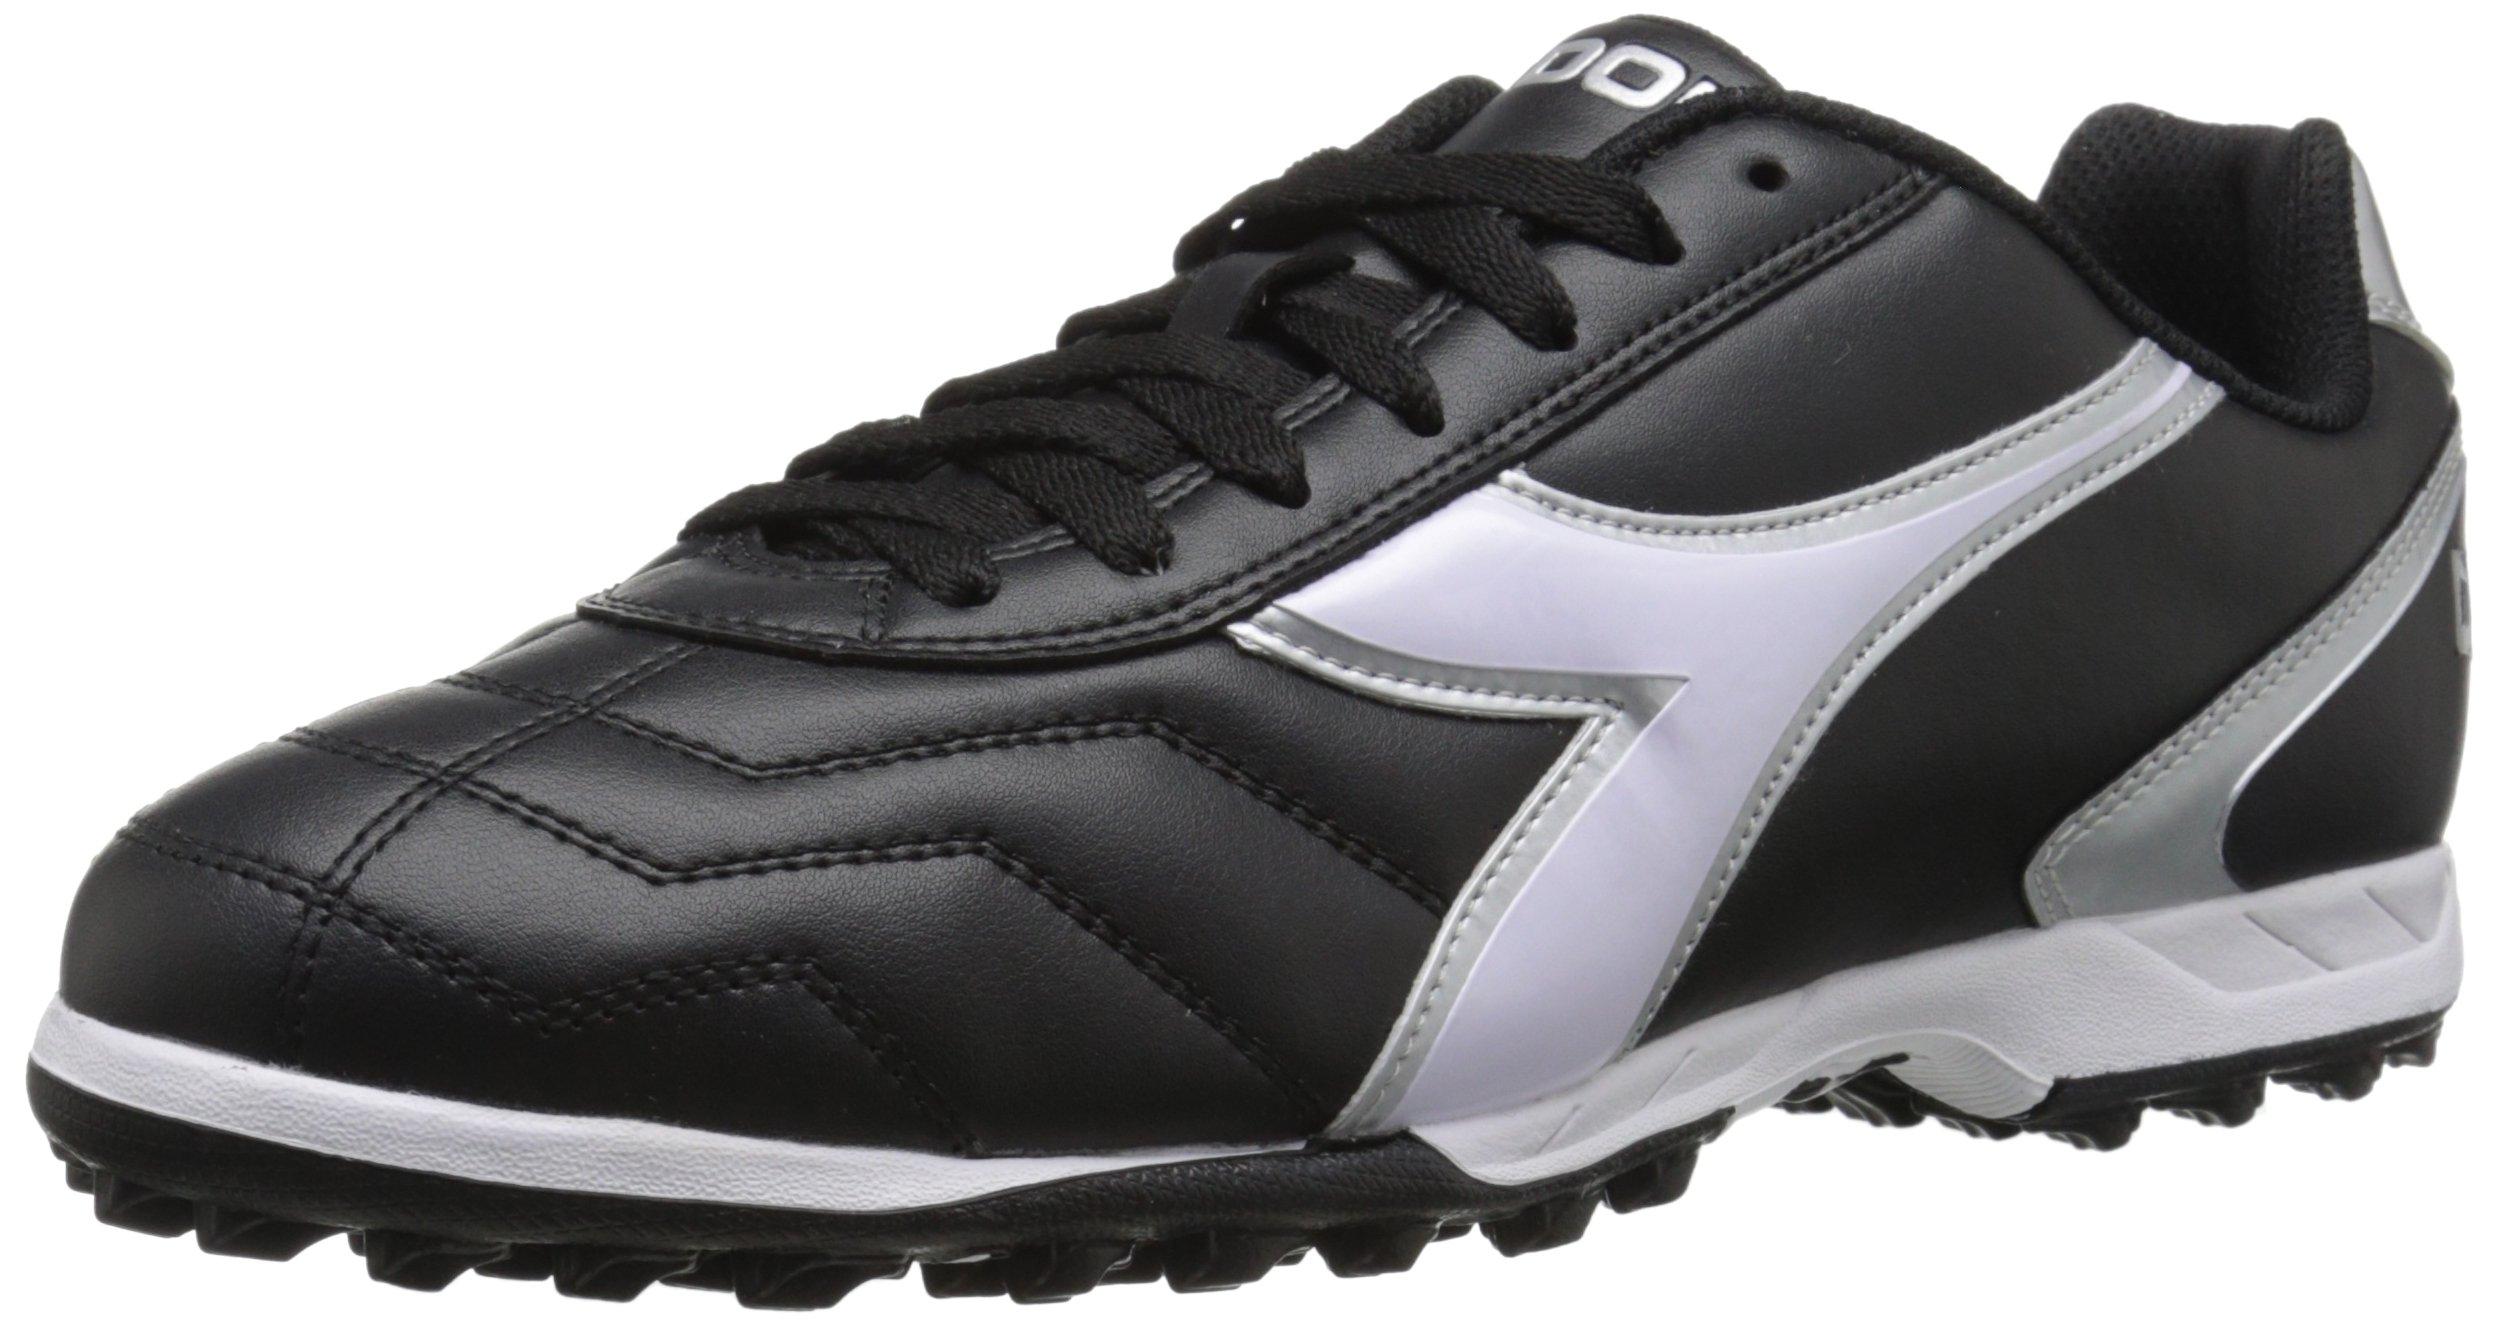 Diadora Men's Capitano Turf Soccer Shoes, Black/White 9 D(M) US